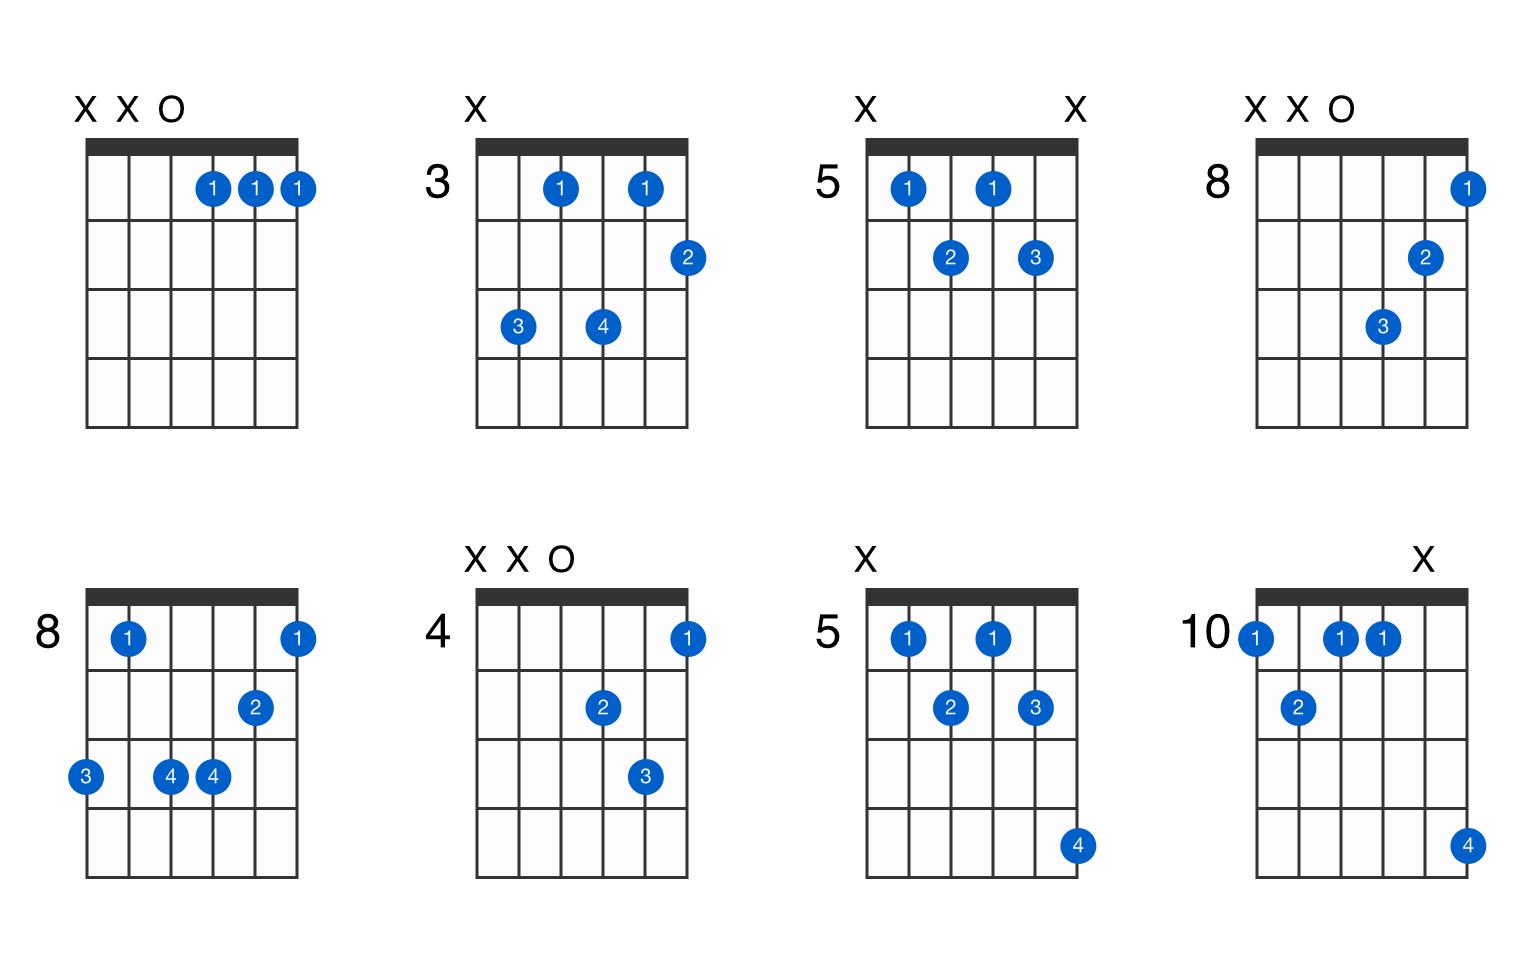 D Minor 7th Flat 5 Guitar Chord Gtrlib Chords